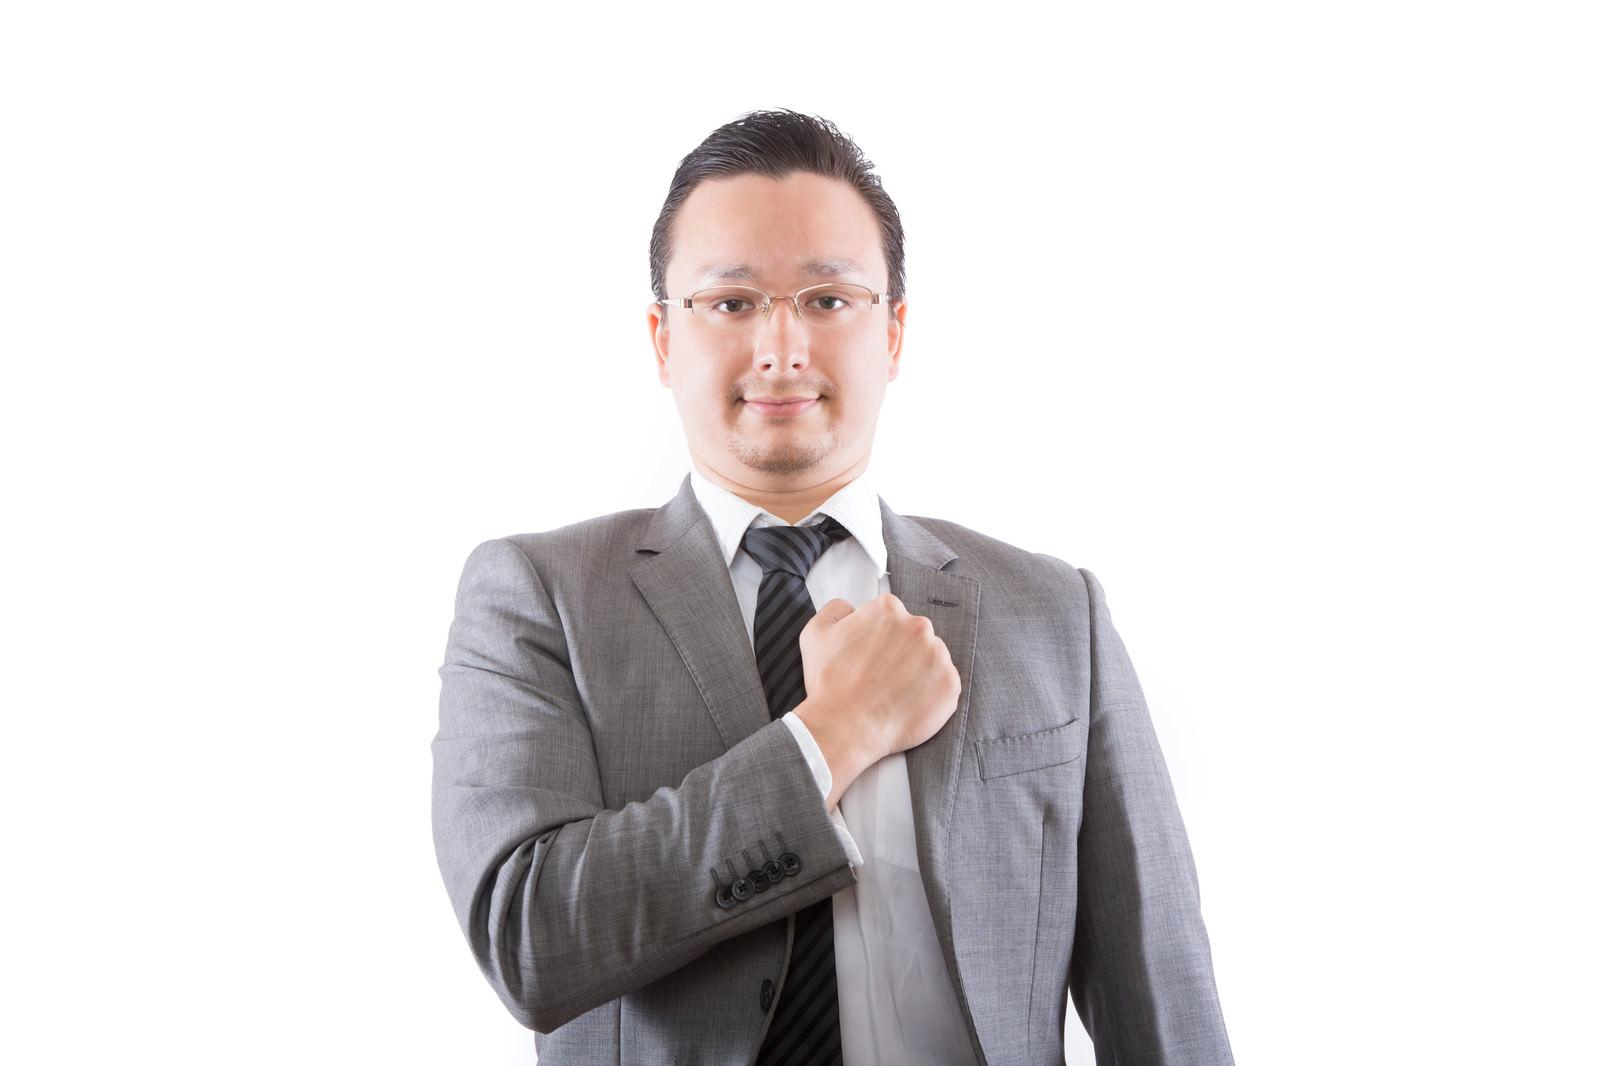 00_PP42_PP_TP_V 【iPadmini】 ガラス交換・液晶交換 やってます!!(≧◇≦)